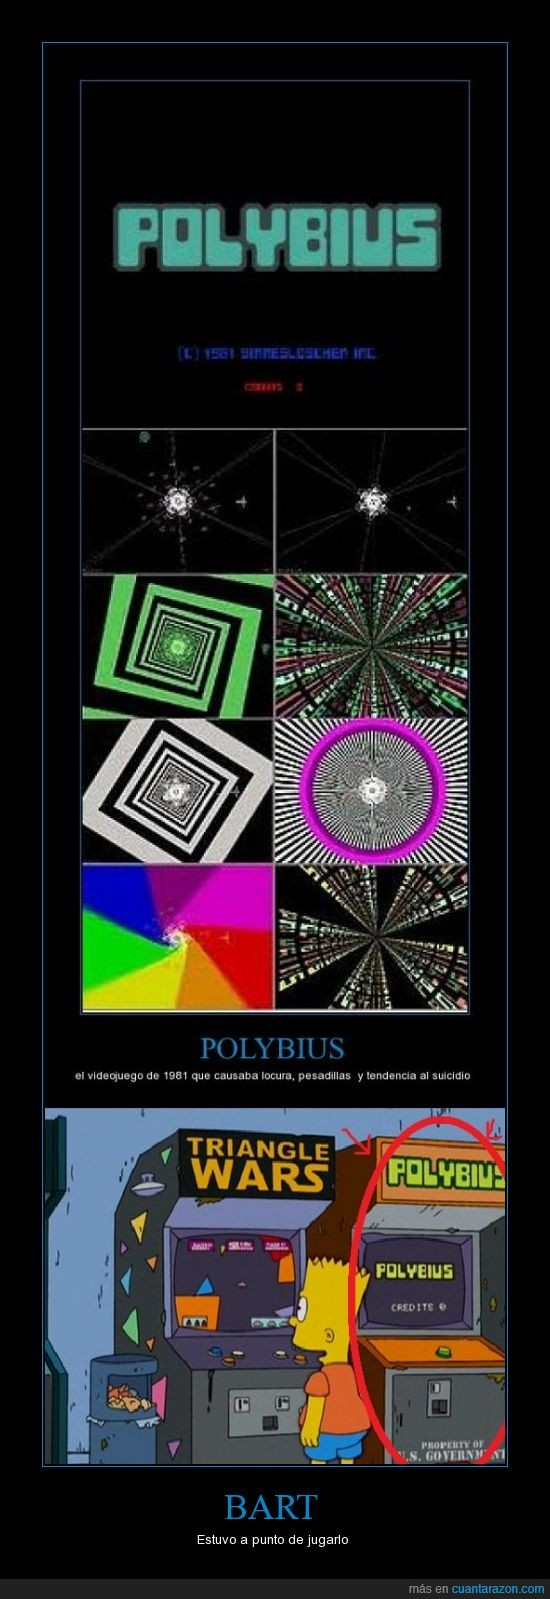 bart,jugar,polybius,simpsons,videojuego